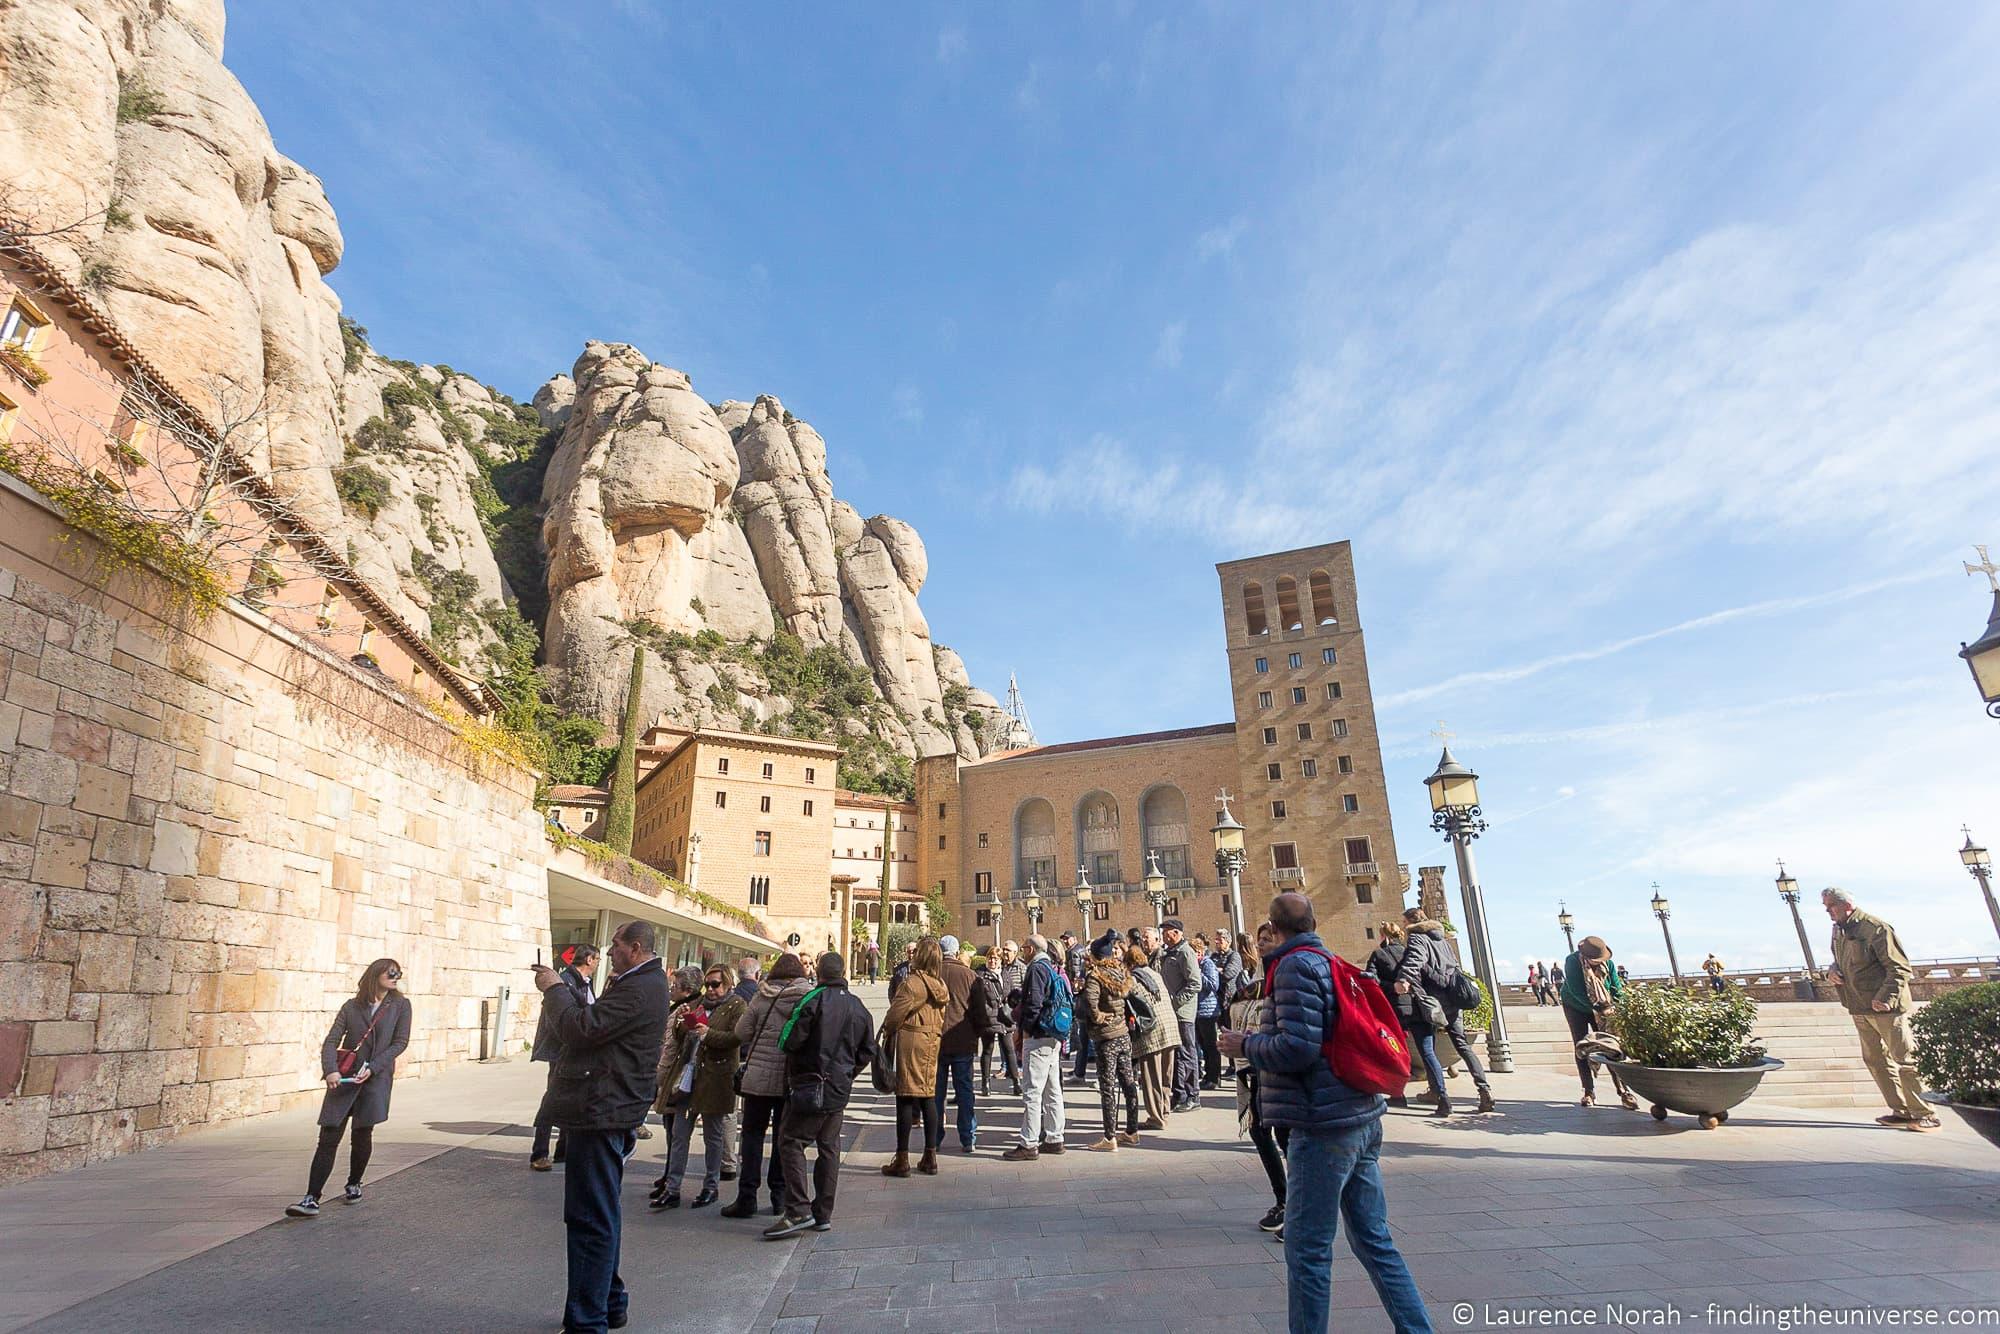 Crowds at Montserrat